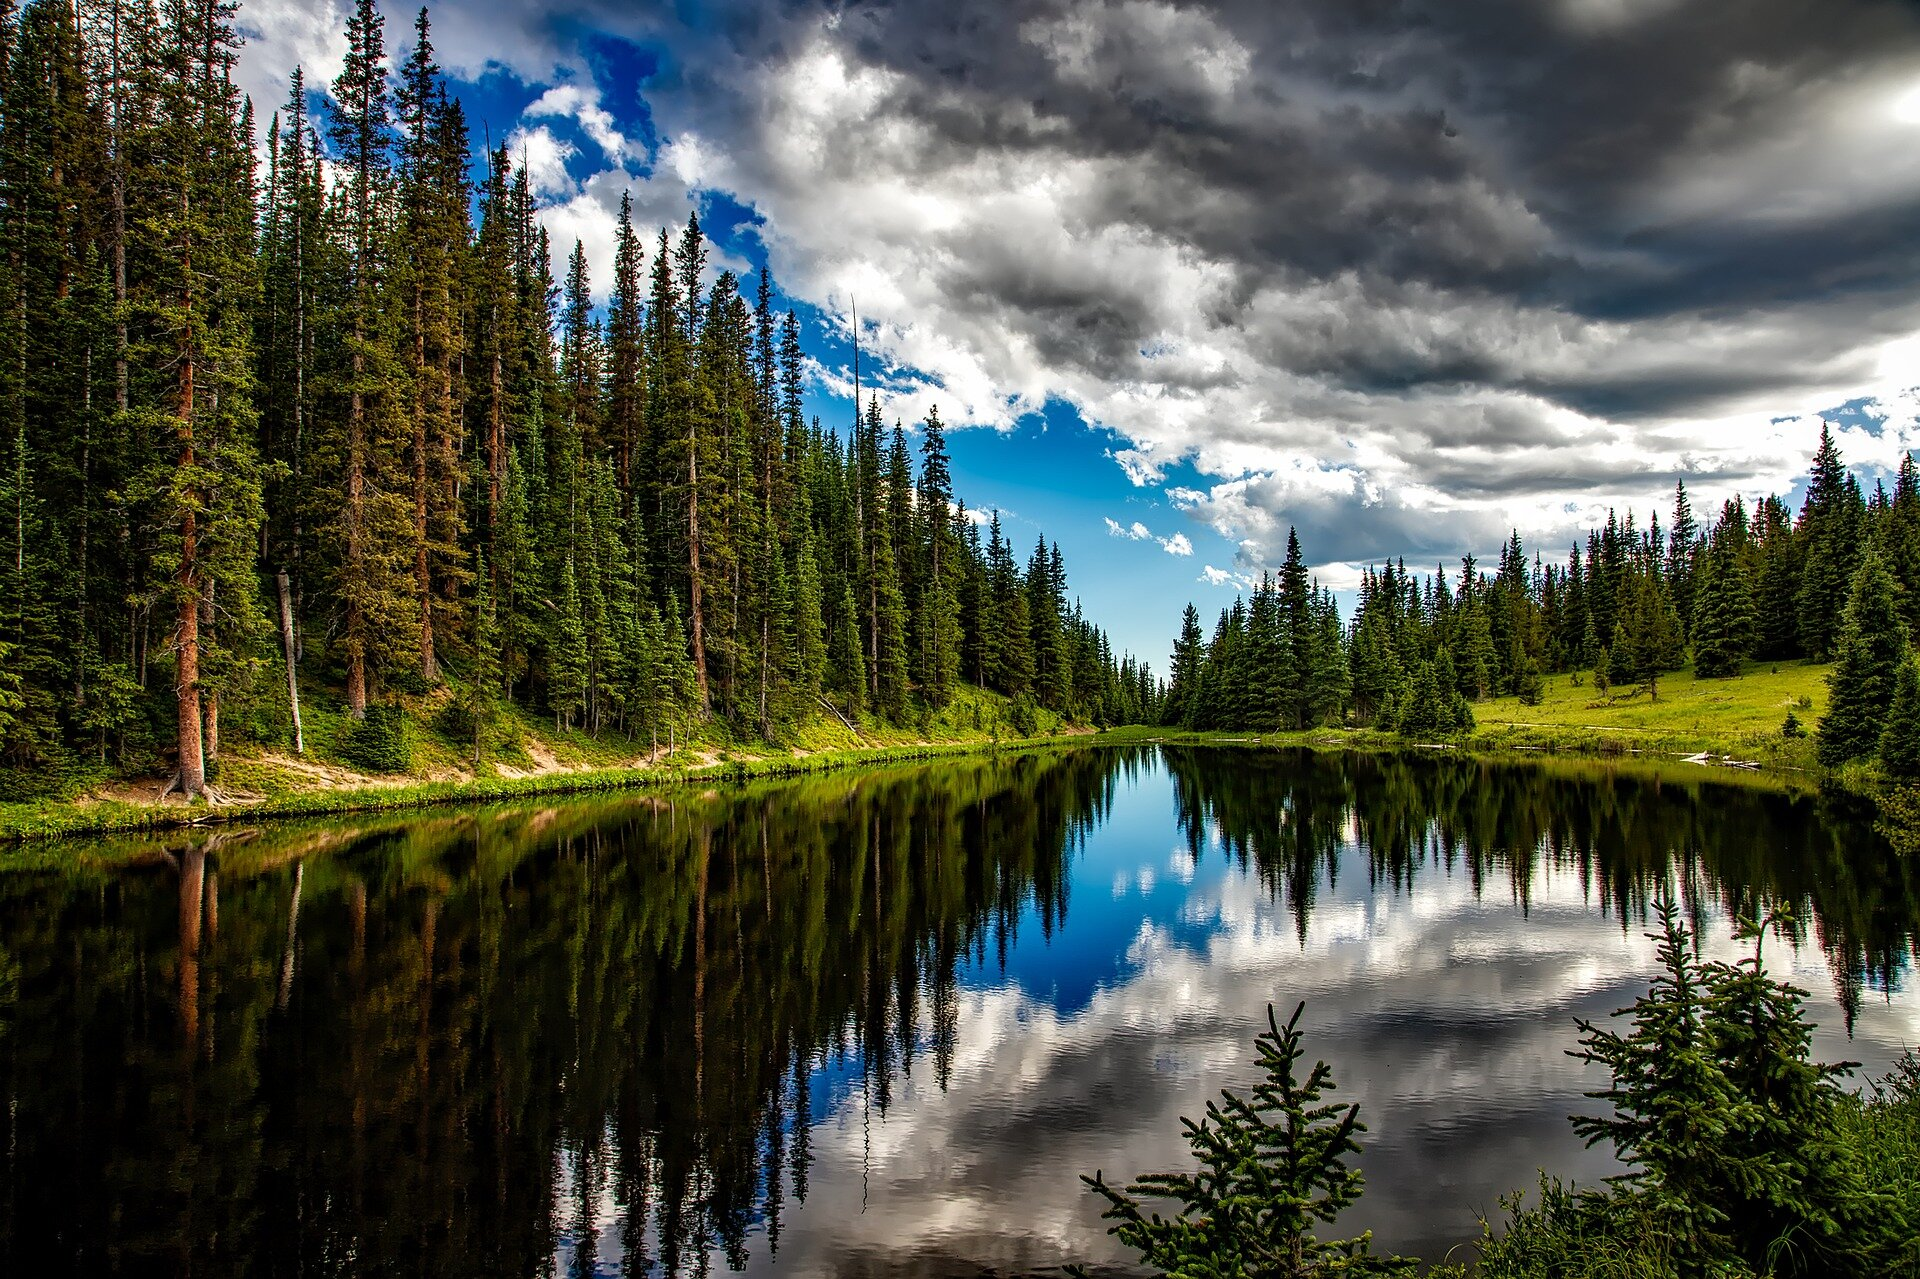 lake-irene-1679708_1920.jpg